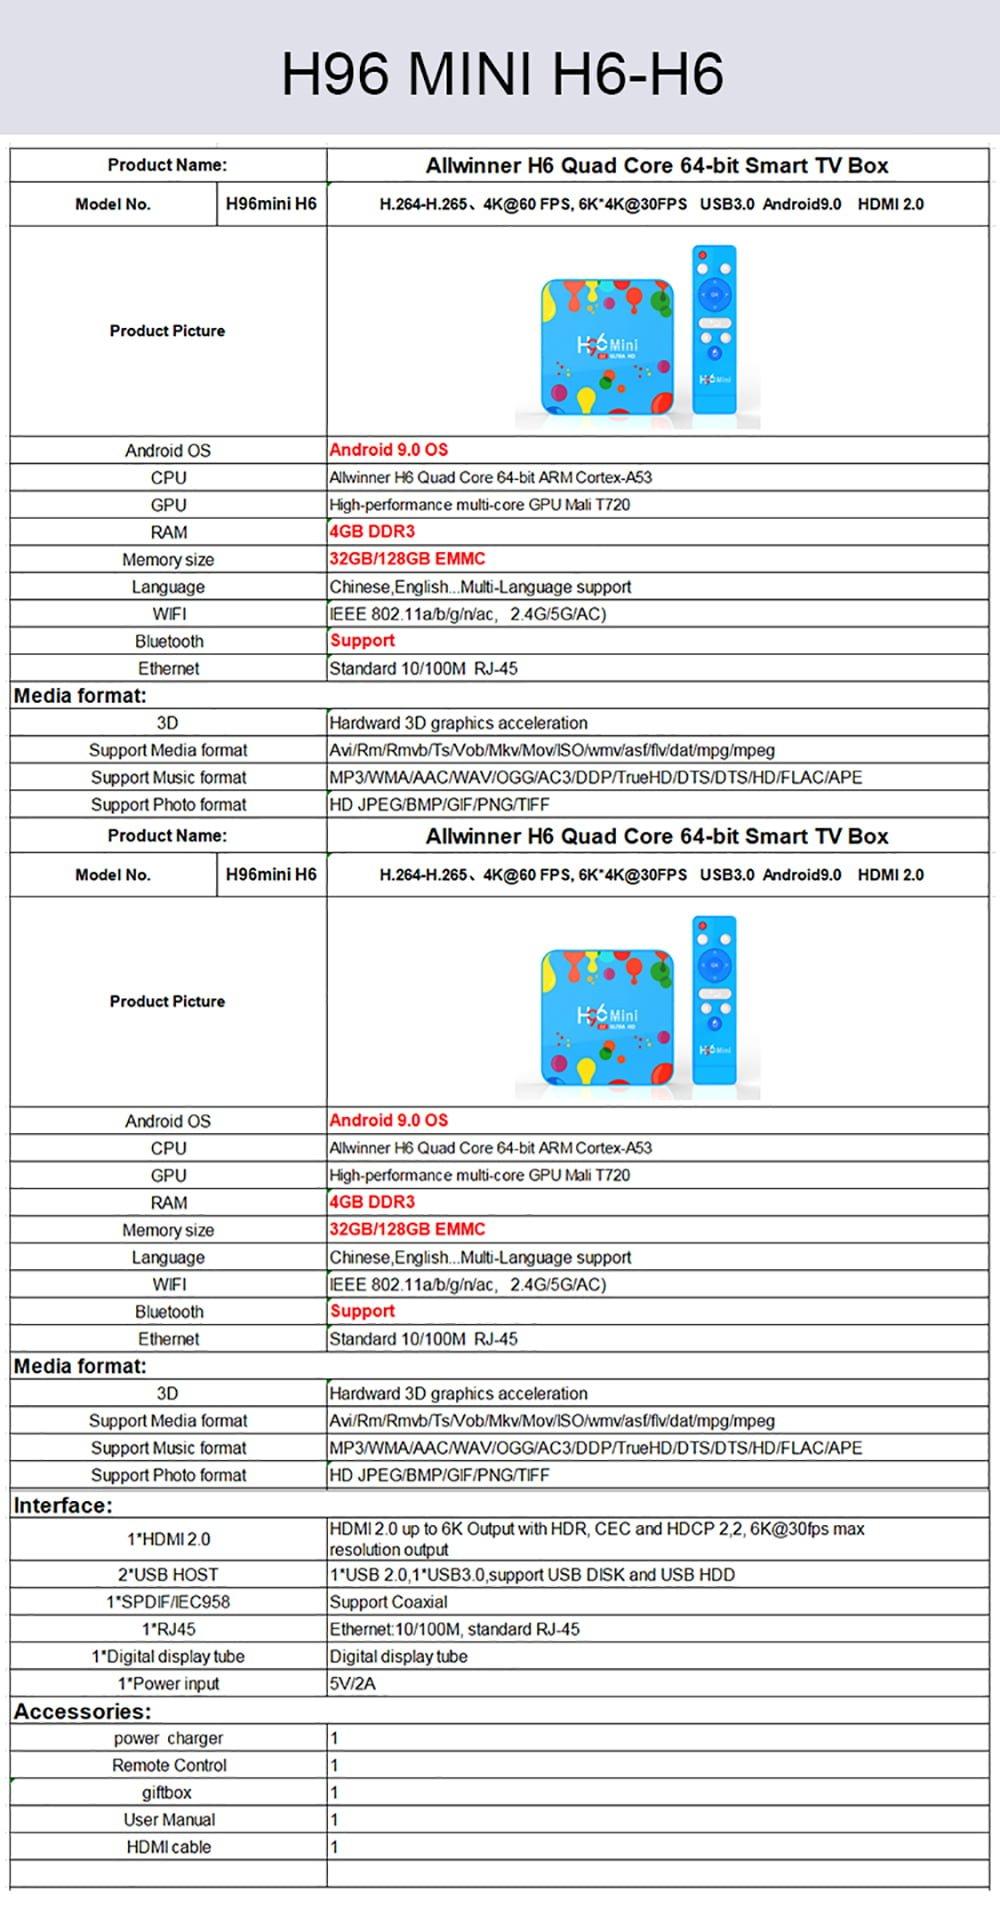 h96 mini h6 android tv box, h96 mini h6 all winner h6, h96 mini, h96 android tv box, h96 128gb, h96 tv box, h96 smart box, h96 ultra hd tv box